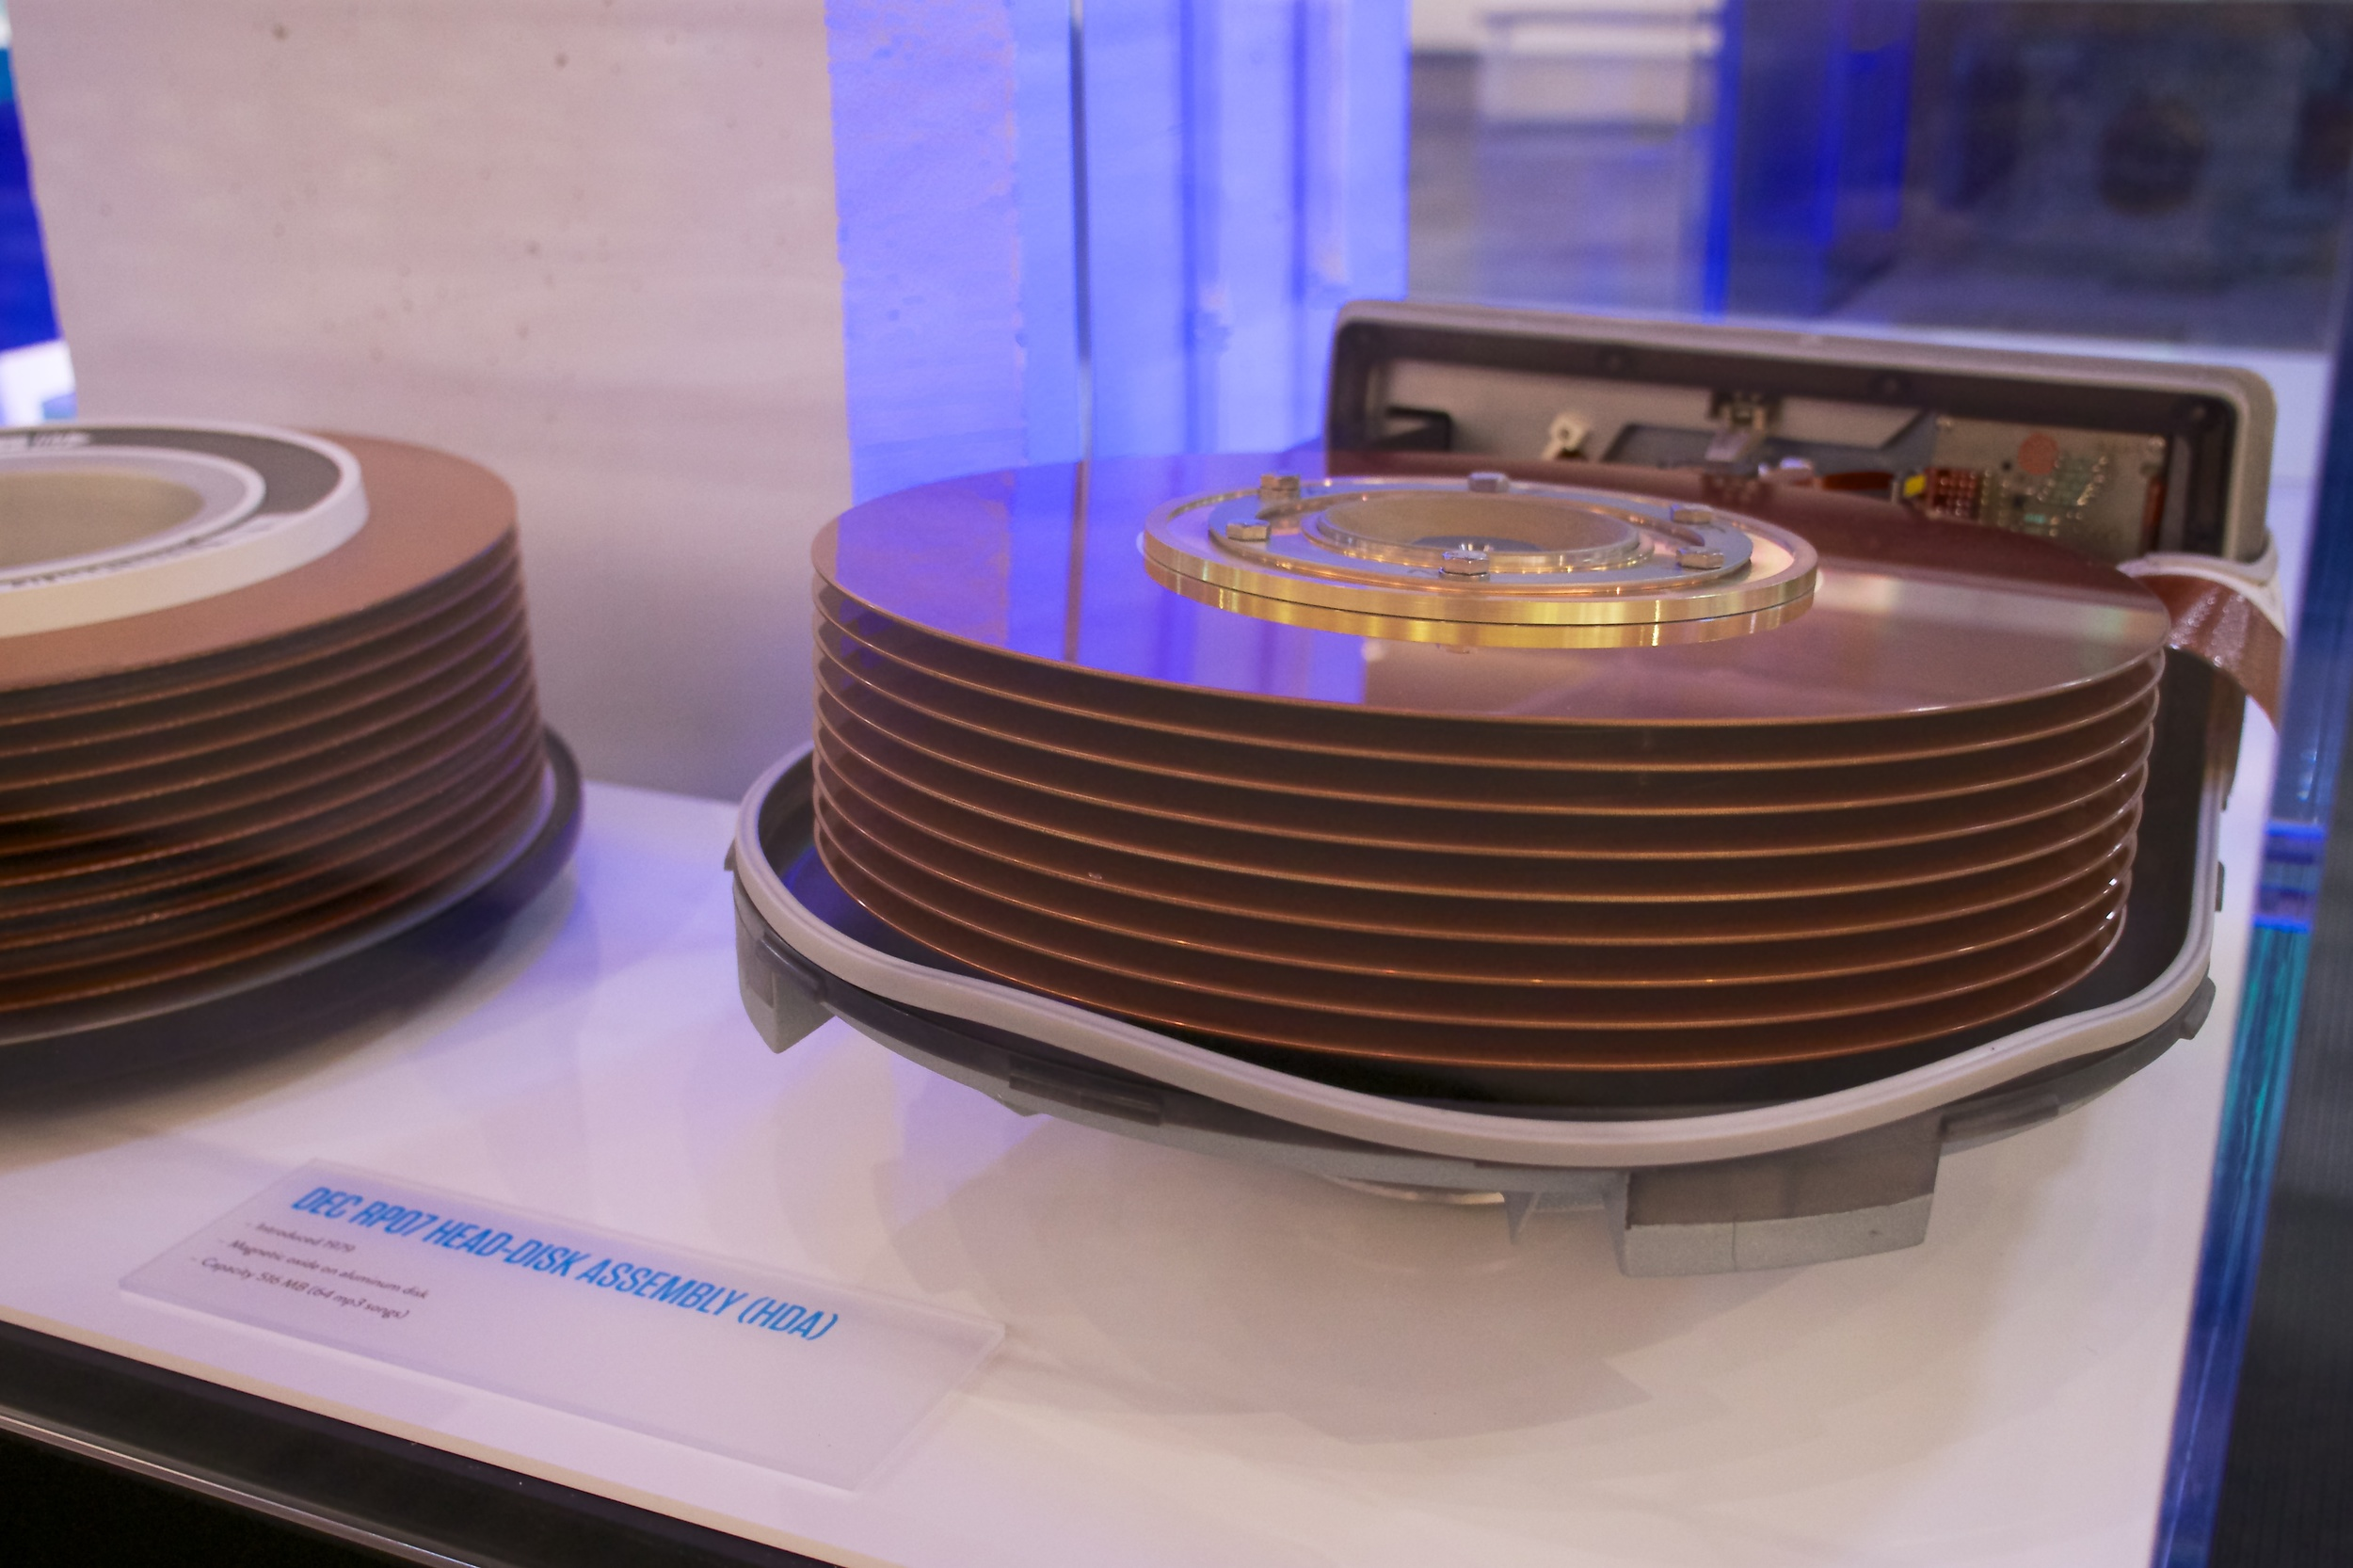 RP07 disk assembly